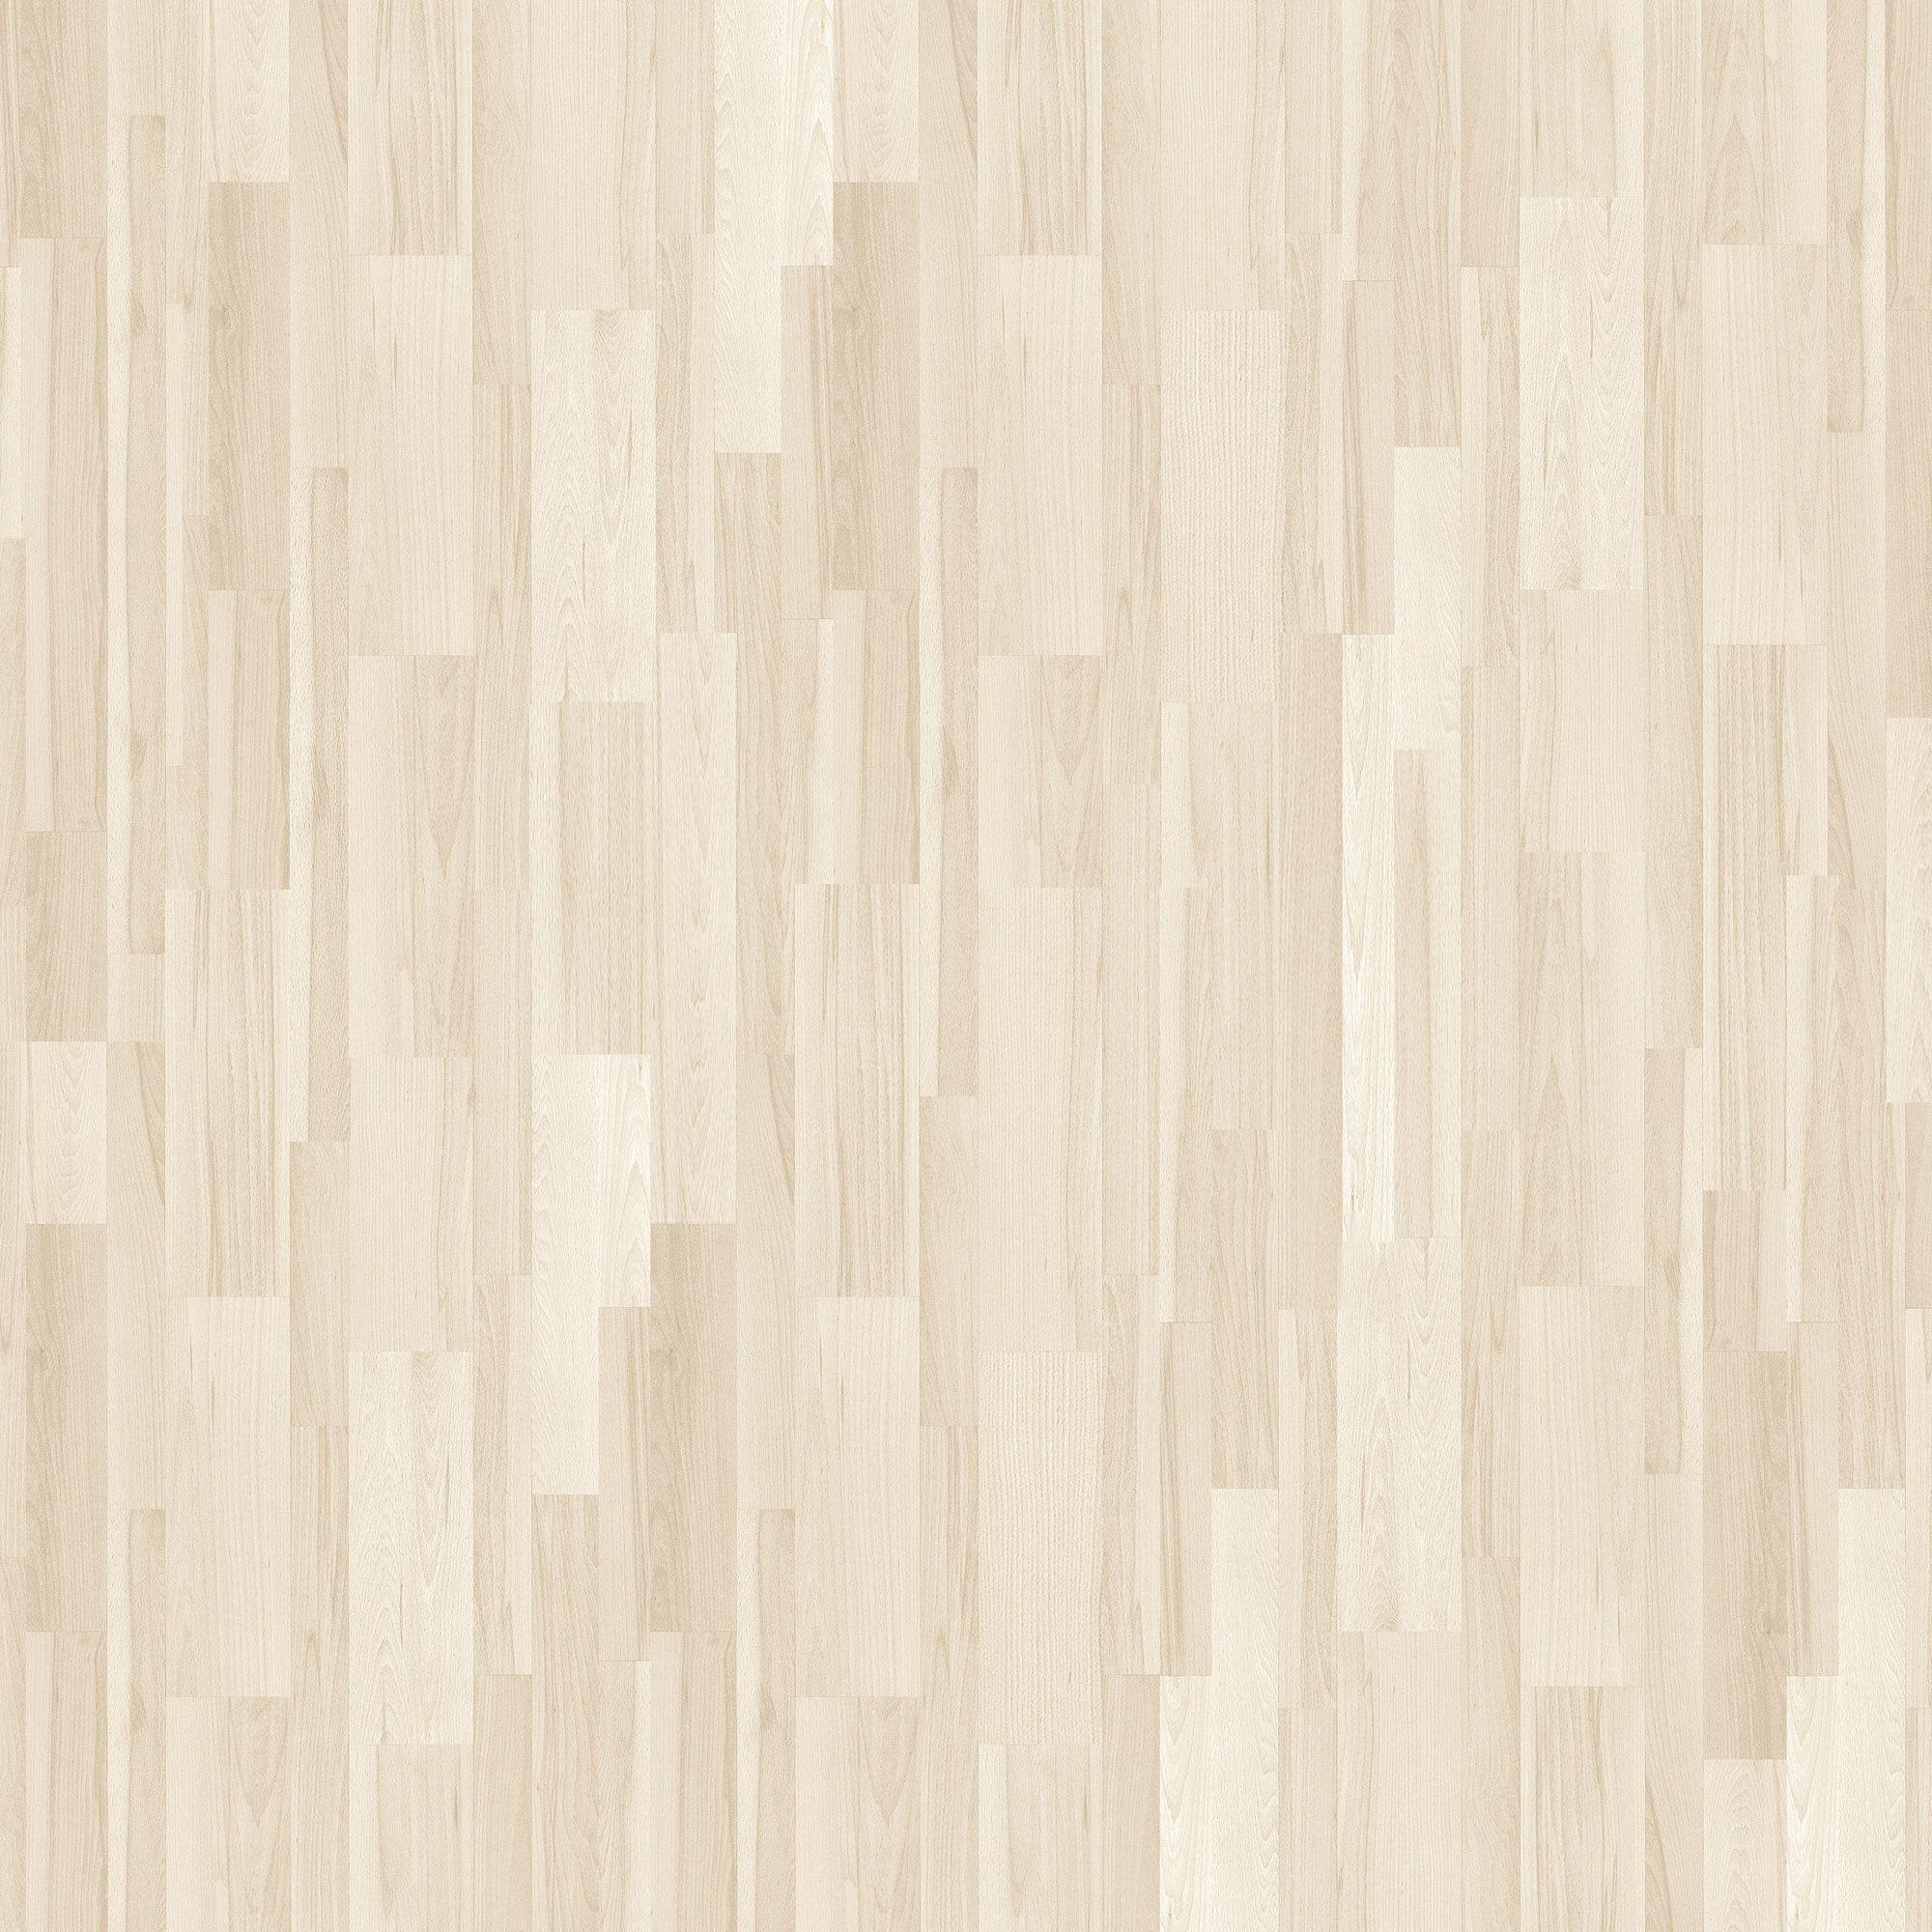 Off White Stone Flooring | ... 2013/09/Wood Planks